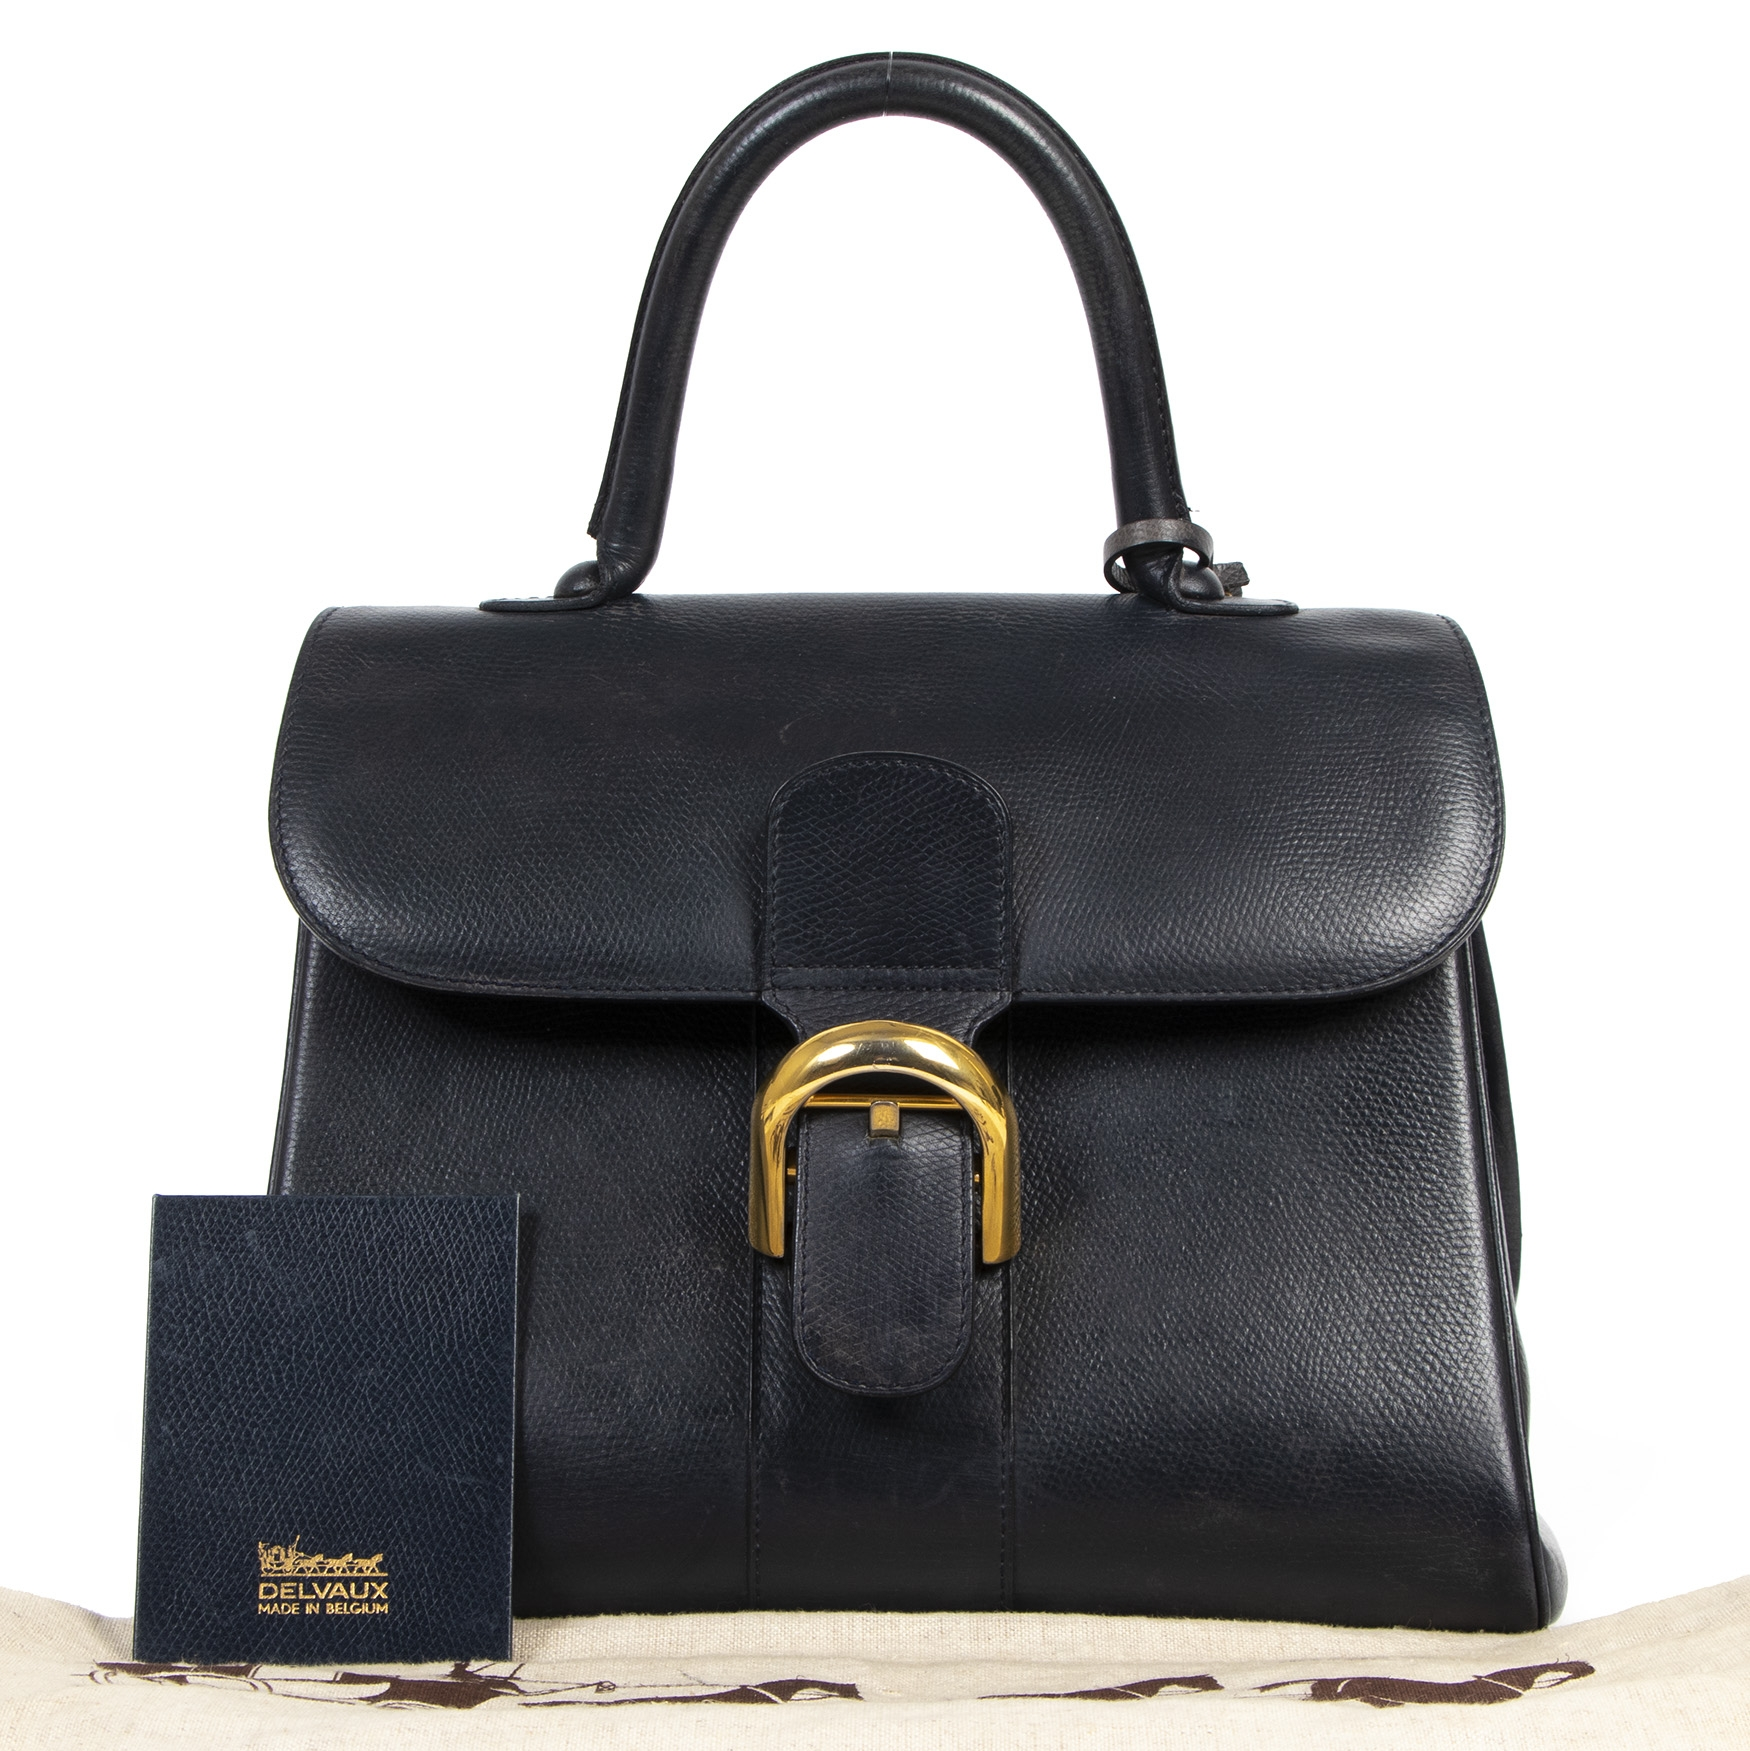 shop safe online Delvaux Brillant Pm Dark Blue